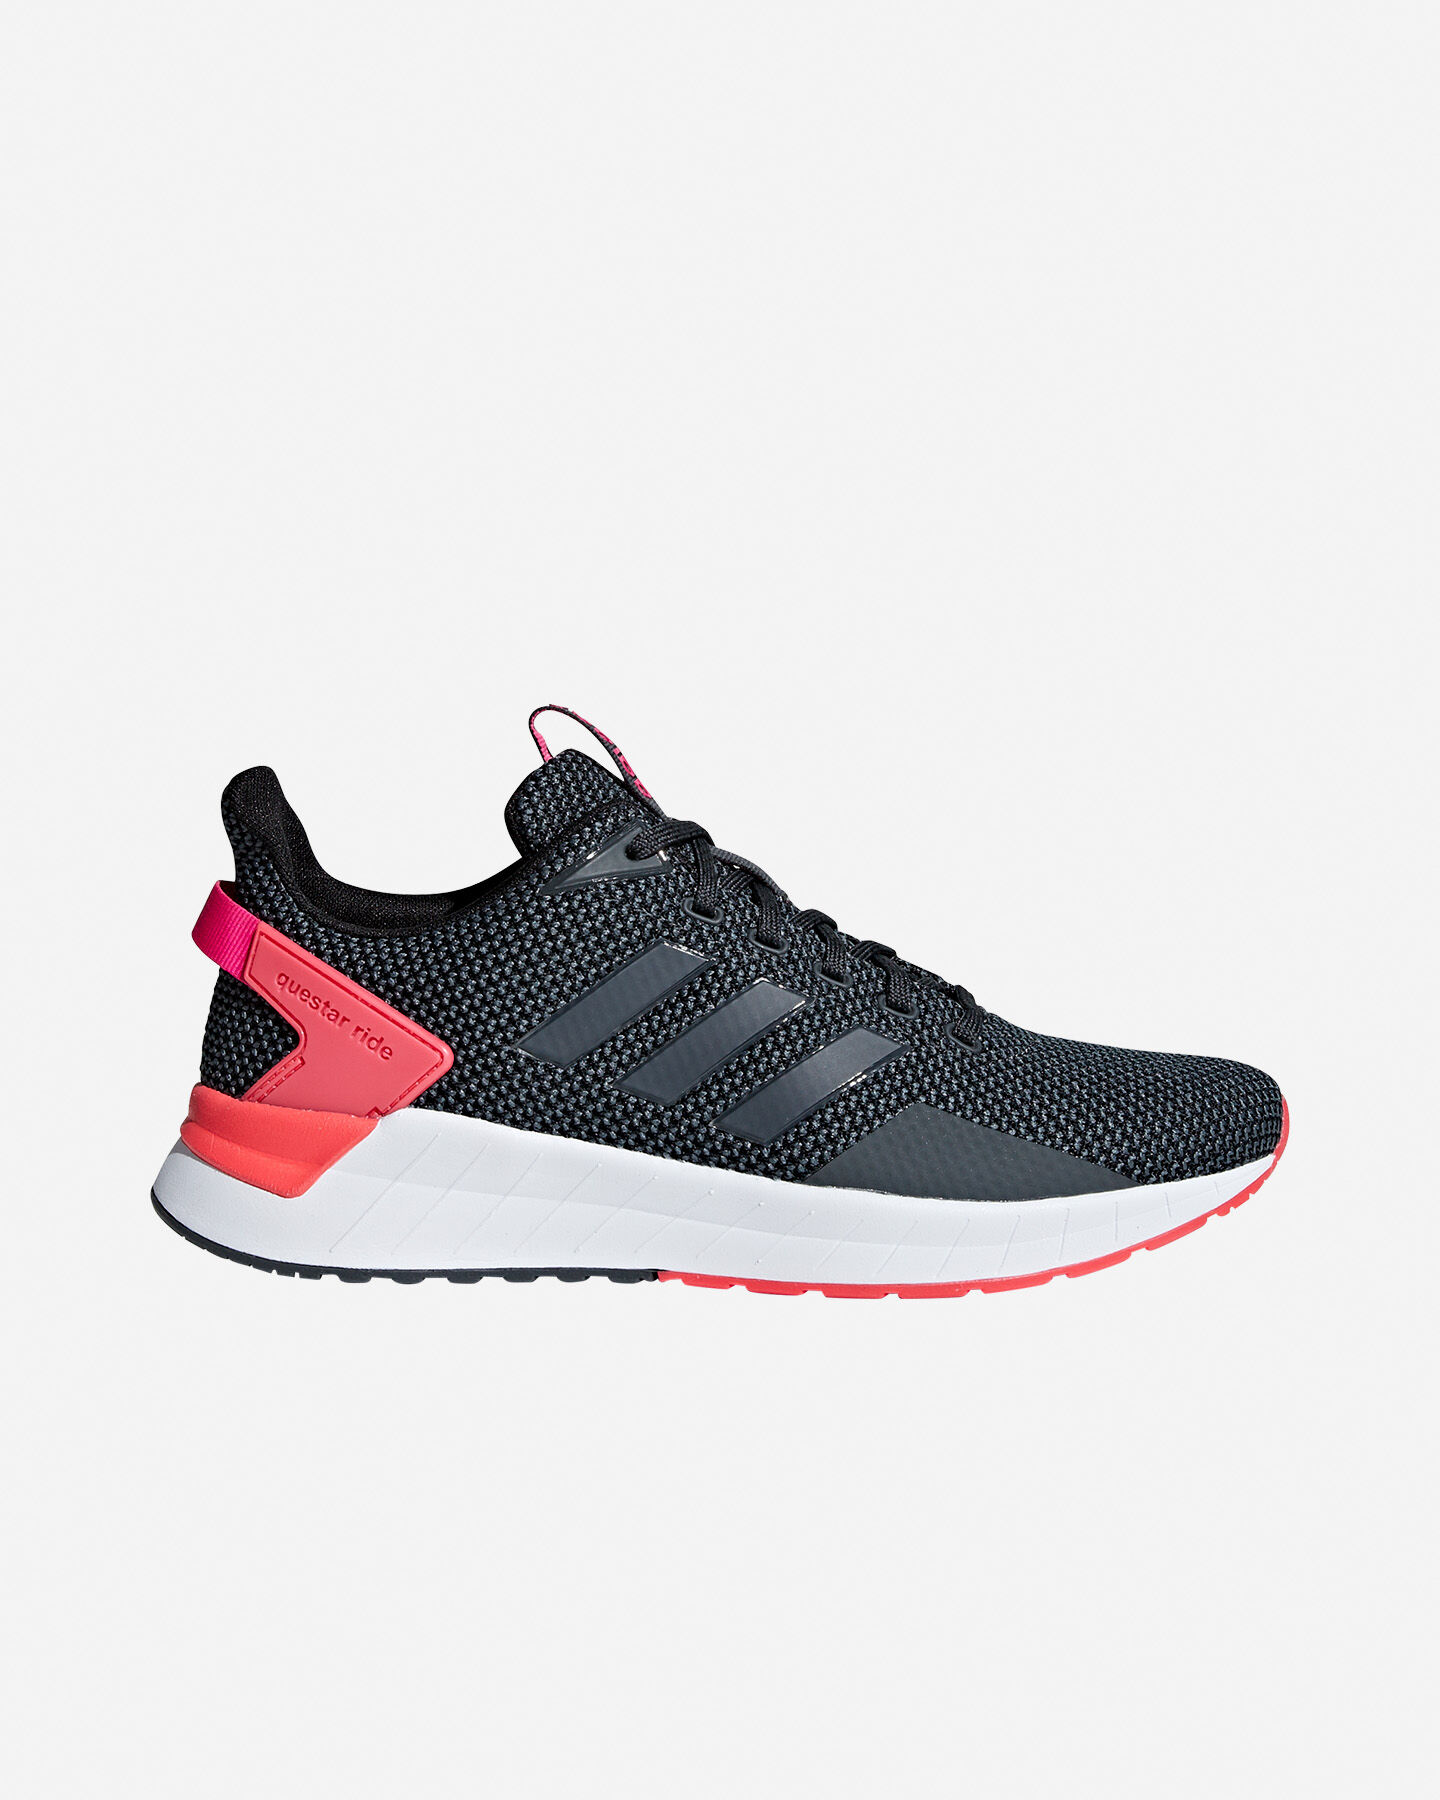 Scarpe Donna Cisalfa Adidas Scarpe Adidas Sport FlKJcT1